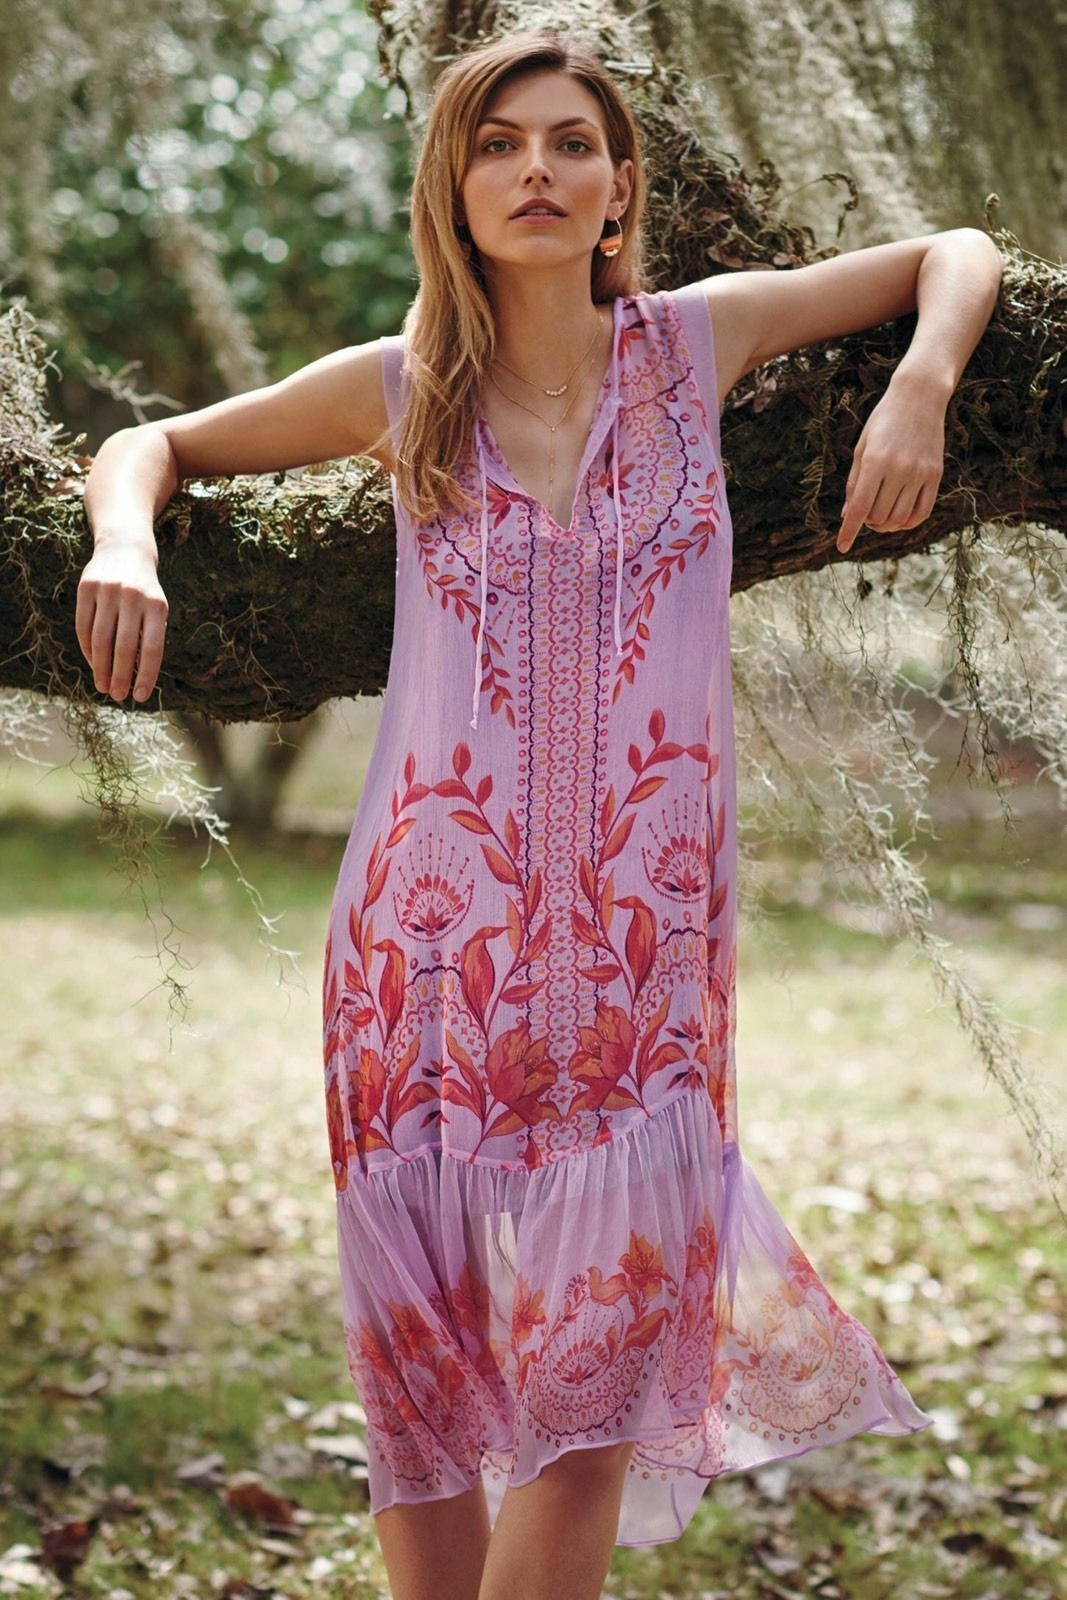 Anthropologie Floreat Wisteria Floral Print Lavender Silk Dress.size 2